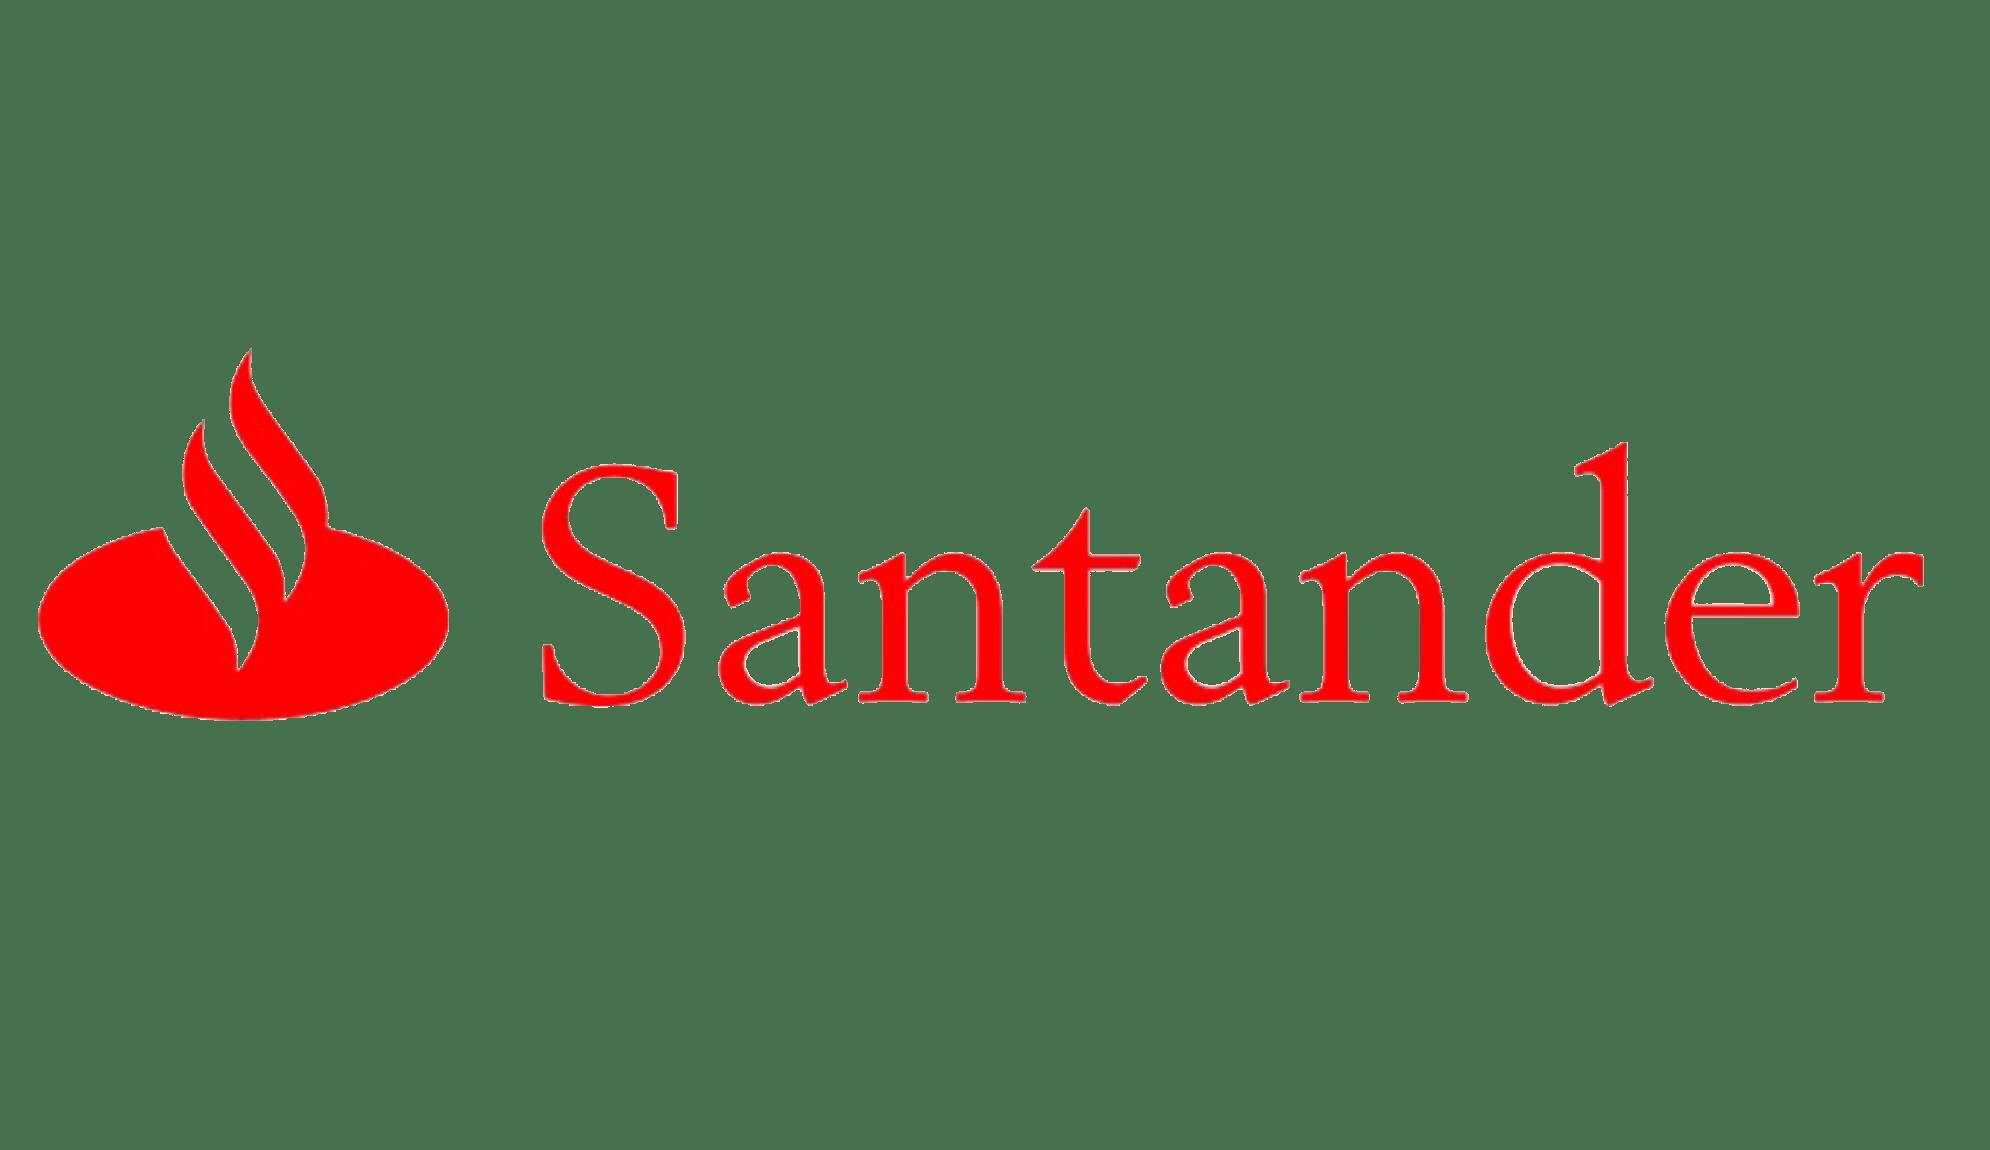 Logo Banco santander max&kitchen catering